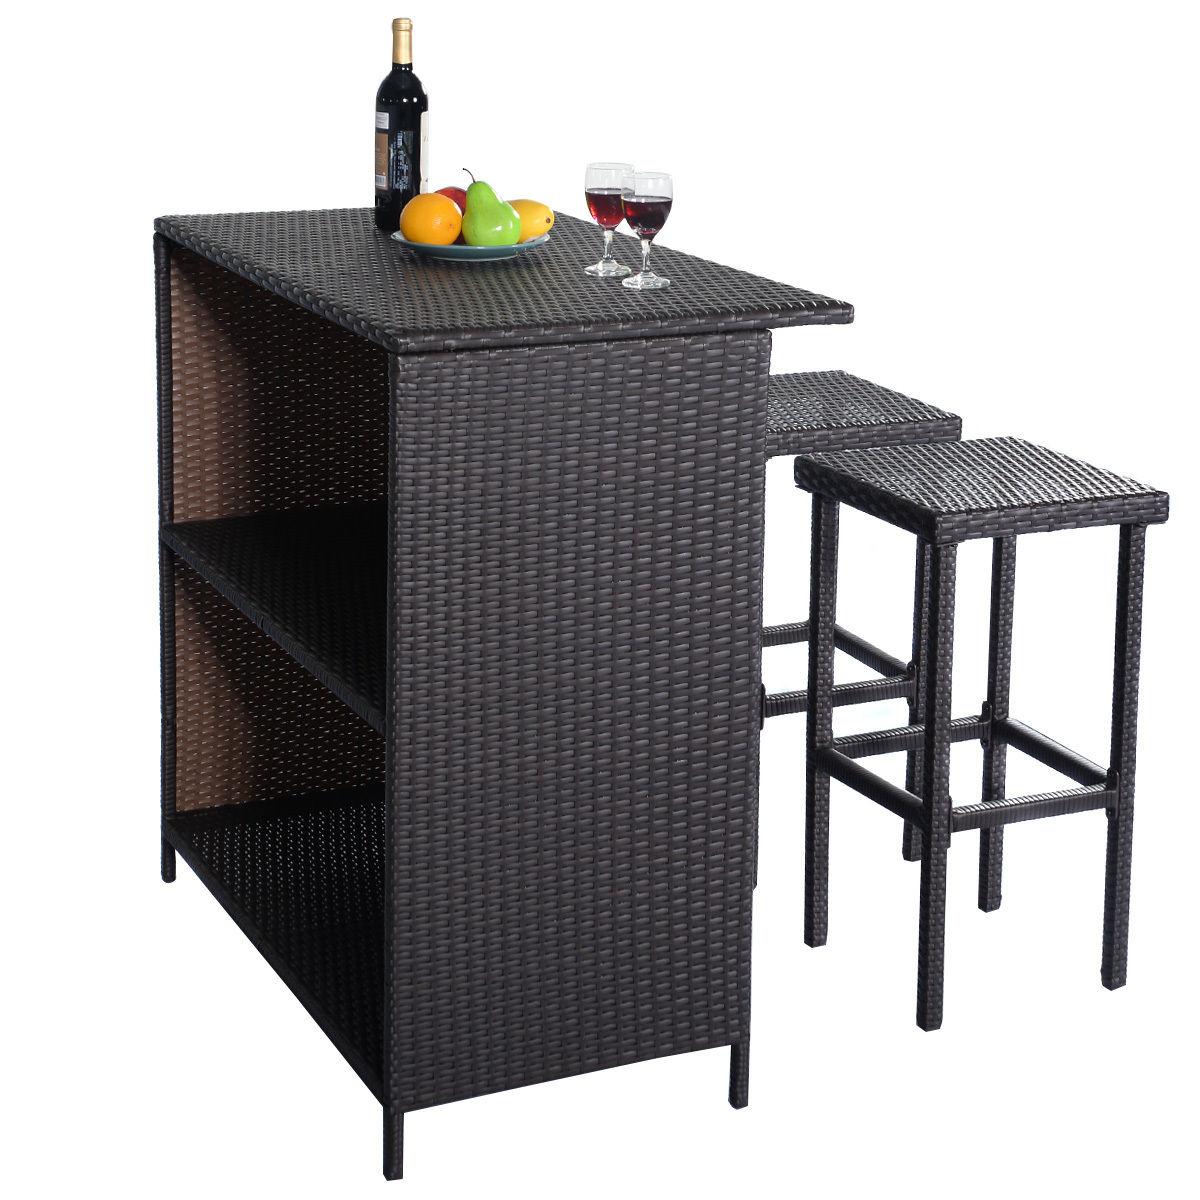 Costway 3PCS Rattan Wicker Bar Set Patio Outdoor Table & 2 Stools Furniture Brown 2